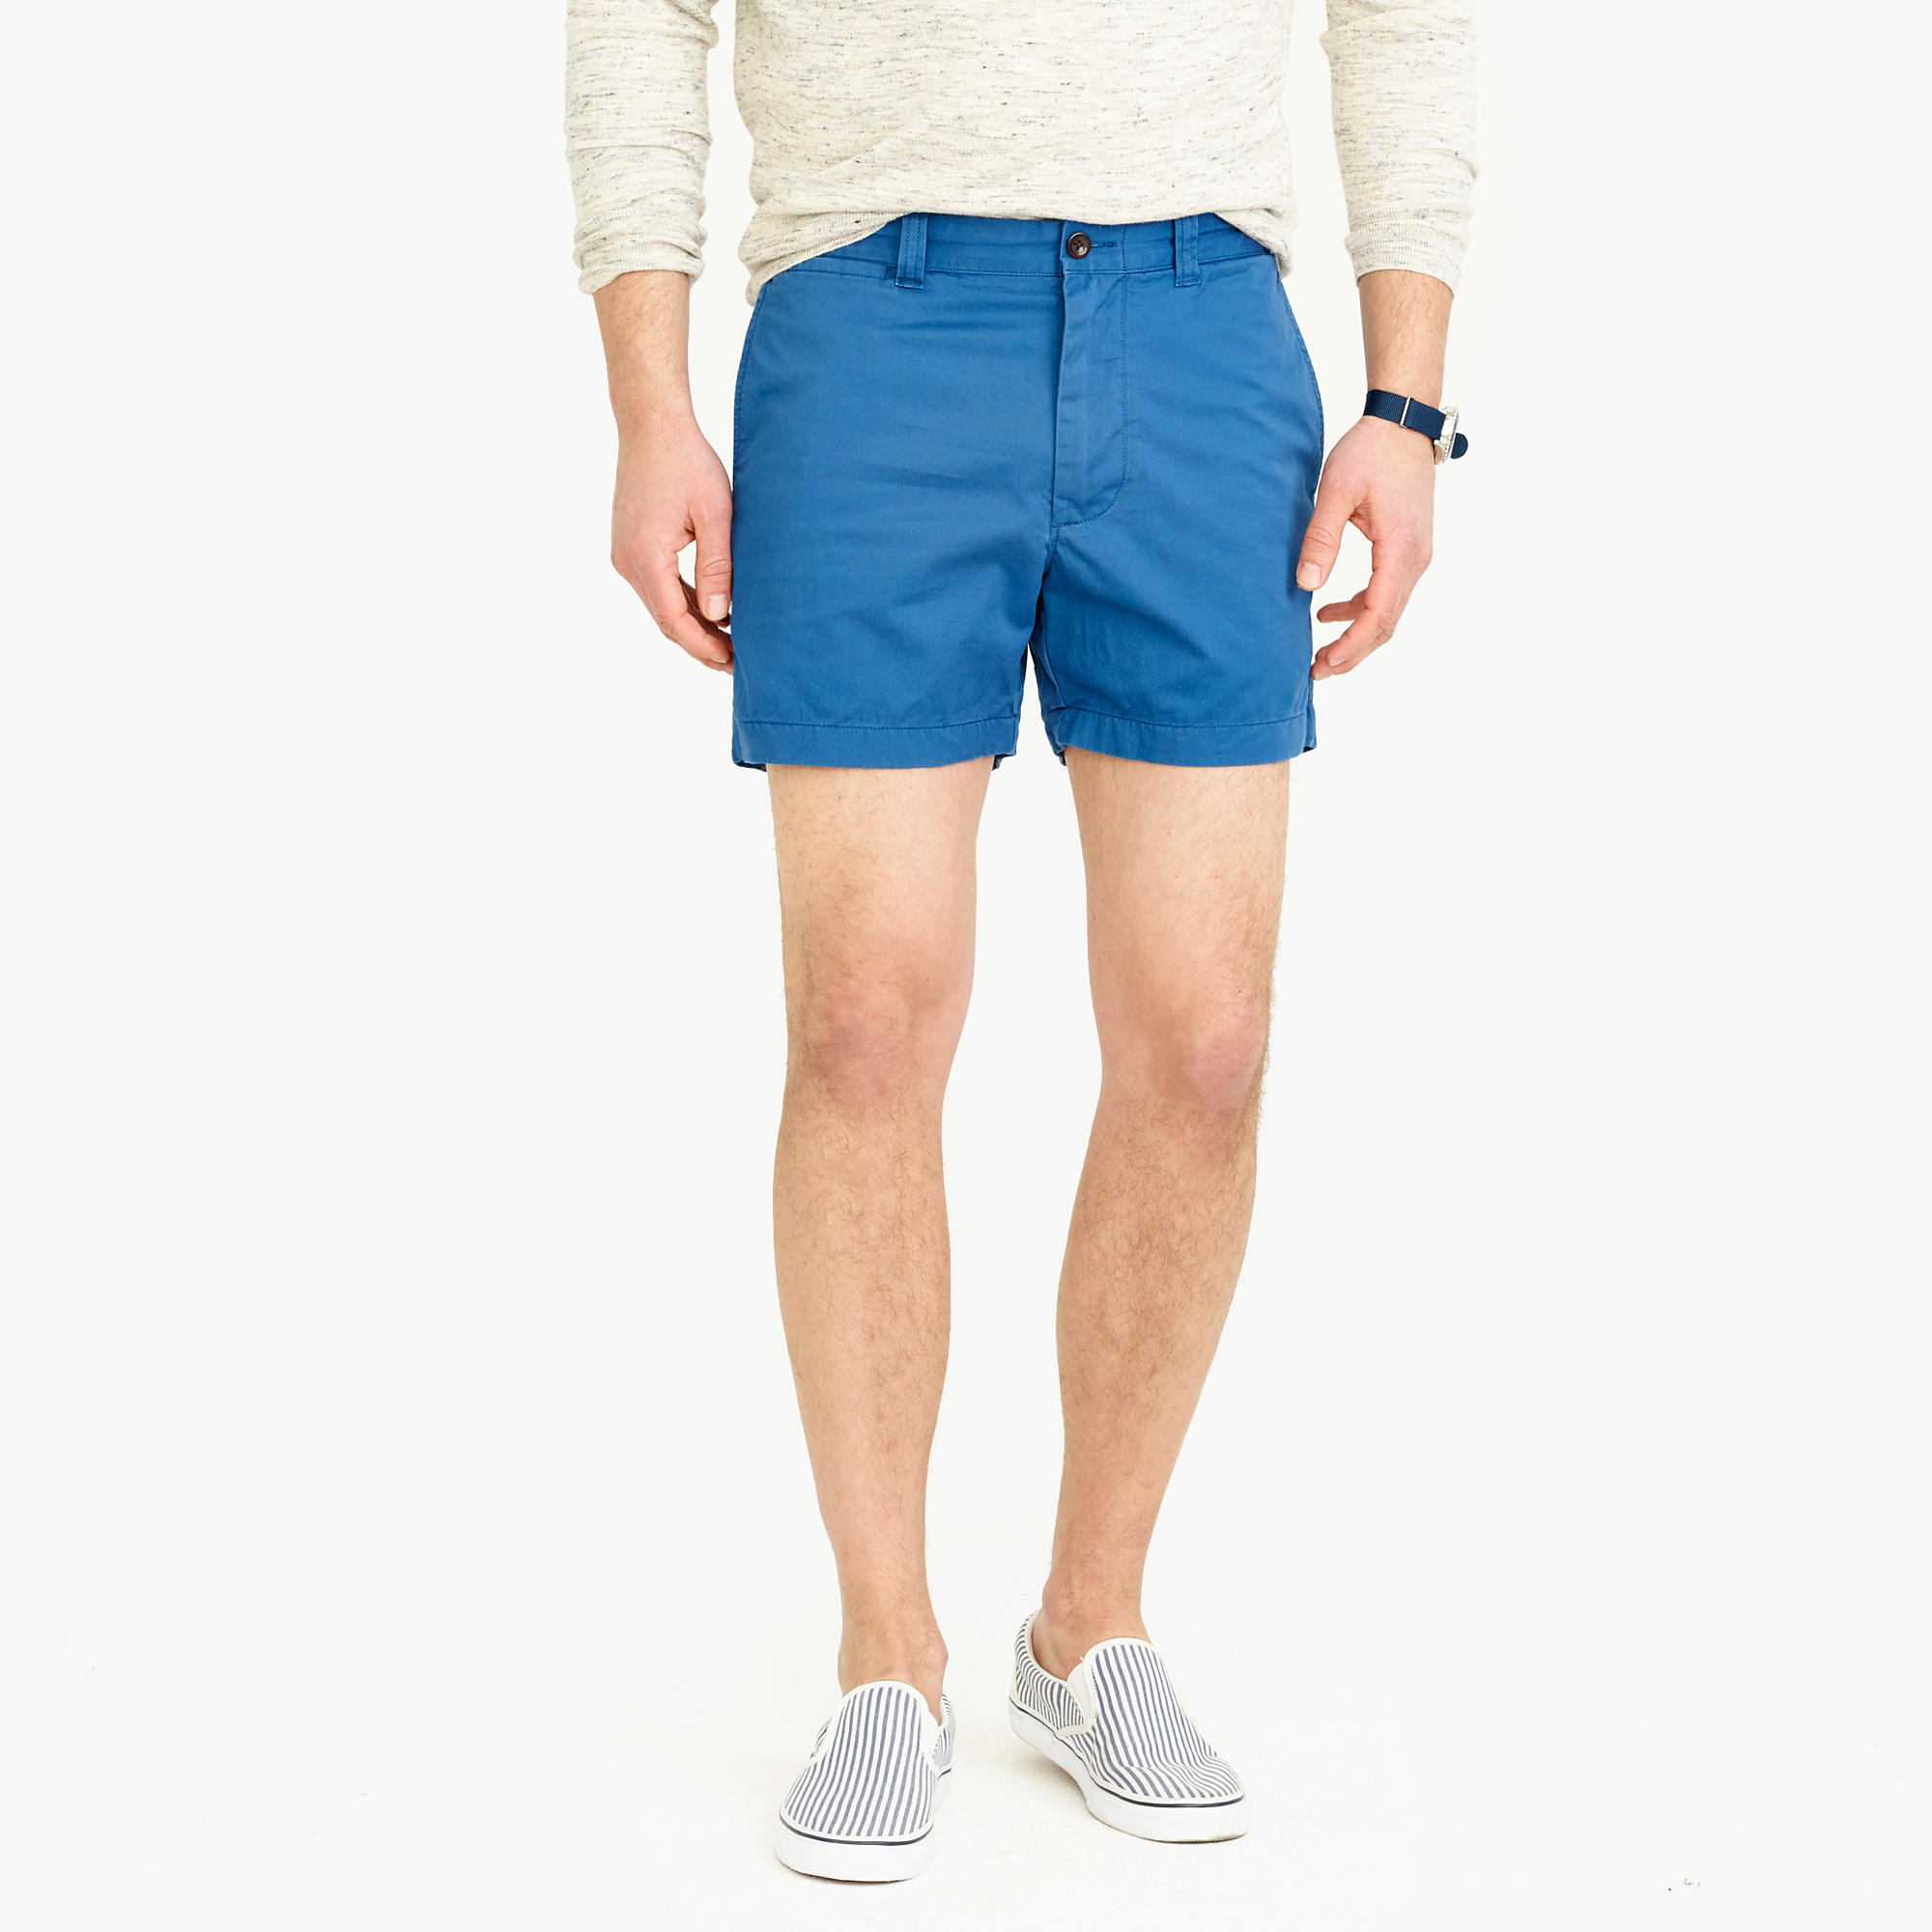 Men's Shorts : Club, Chino & More | J.Crew